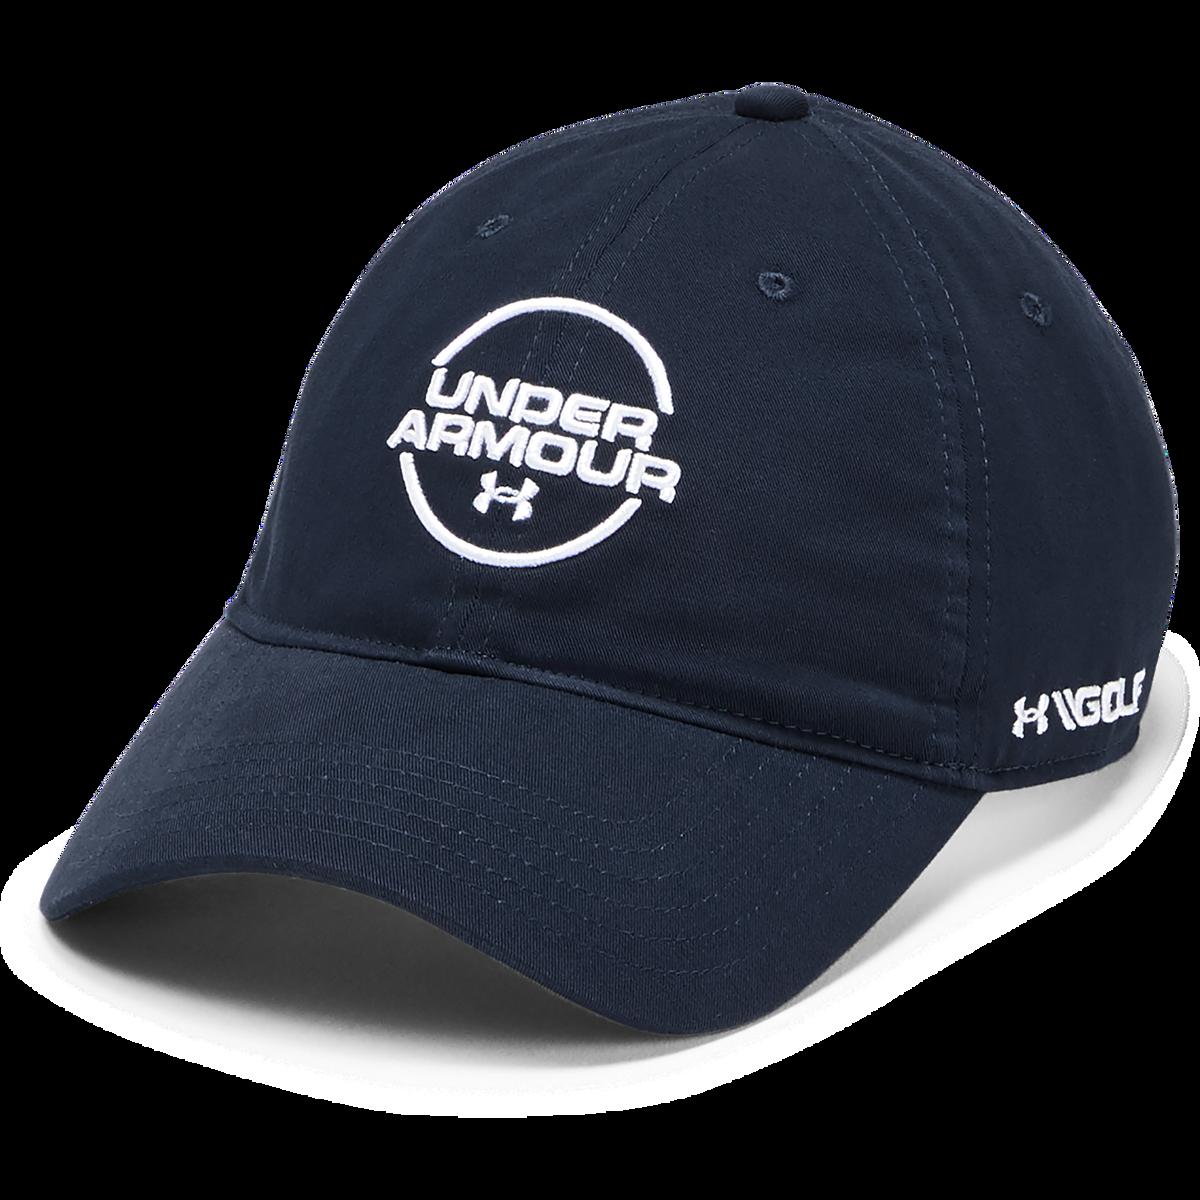 77ca50c1152 Under Armour Jordan Spieth Washed Cotton Hat | PGA TOUR Superstore